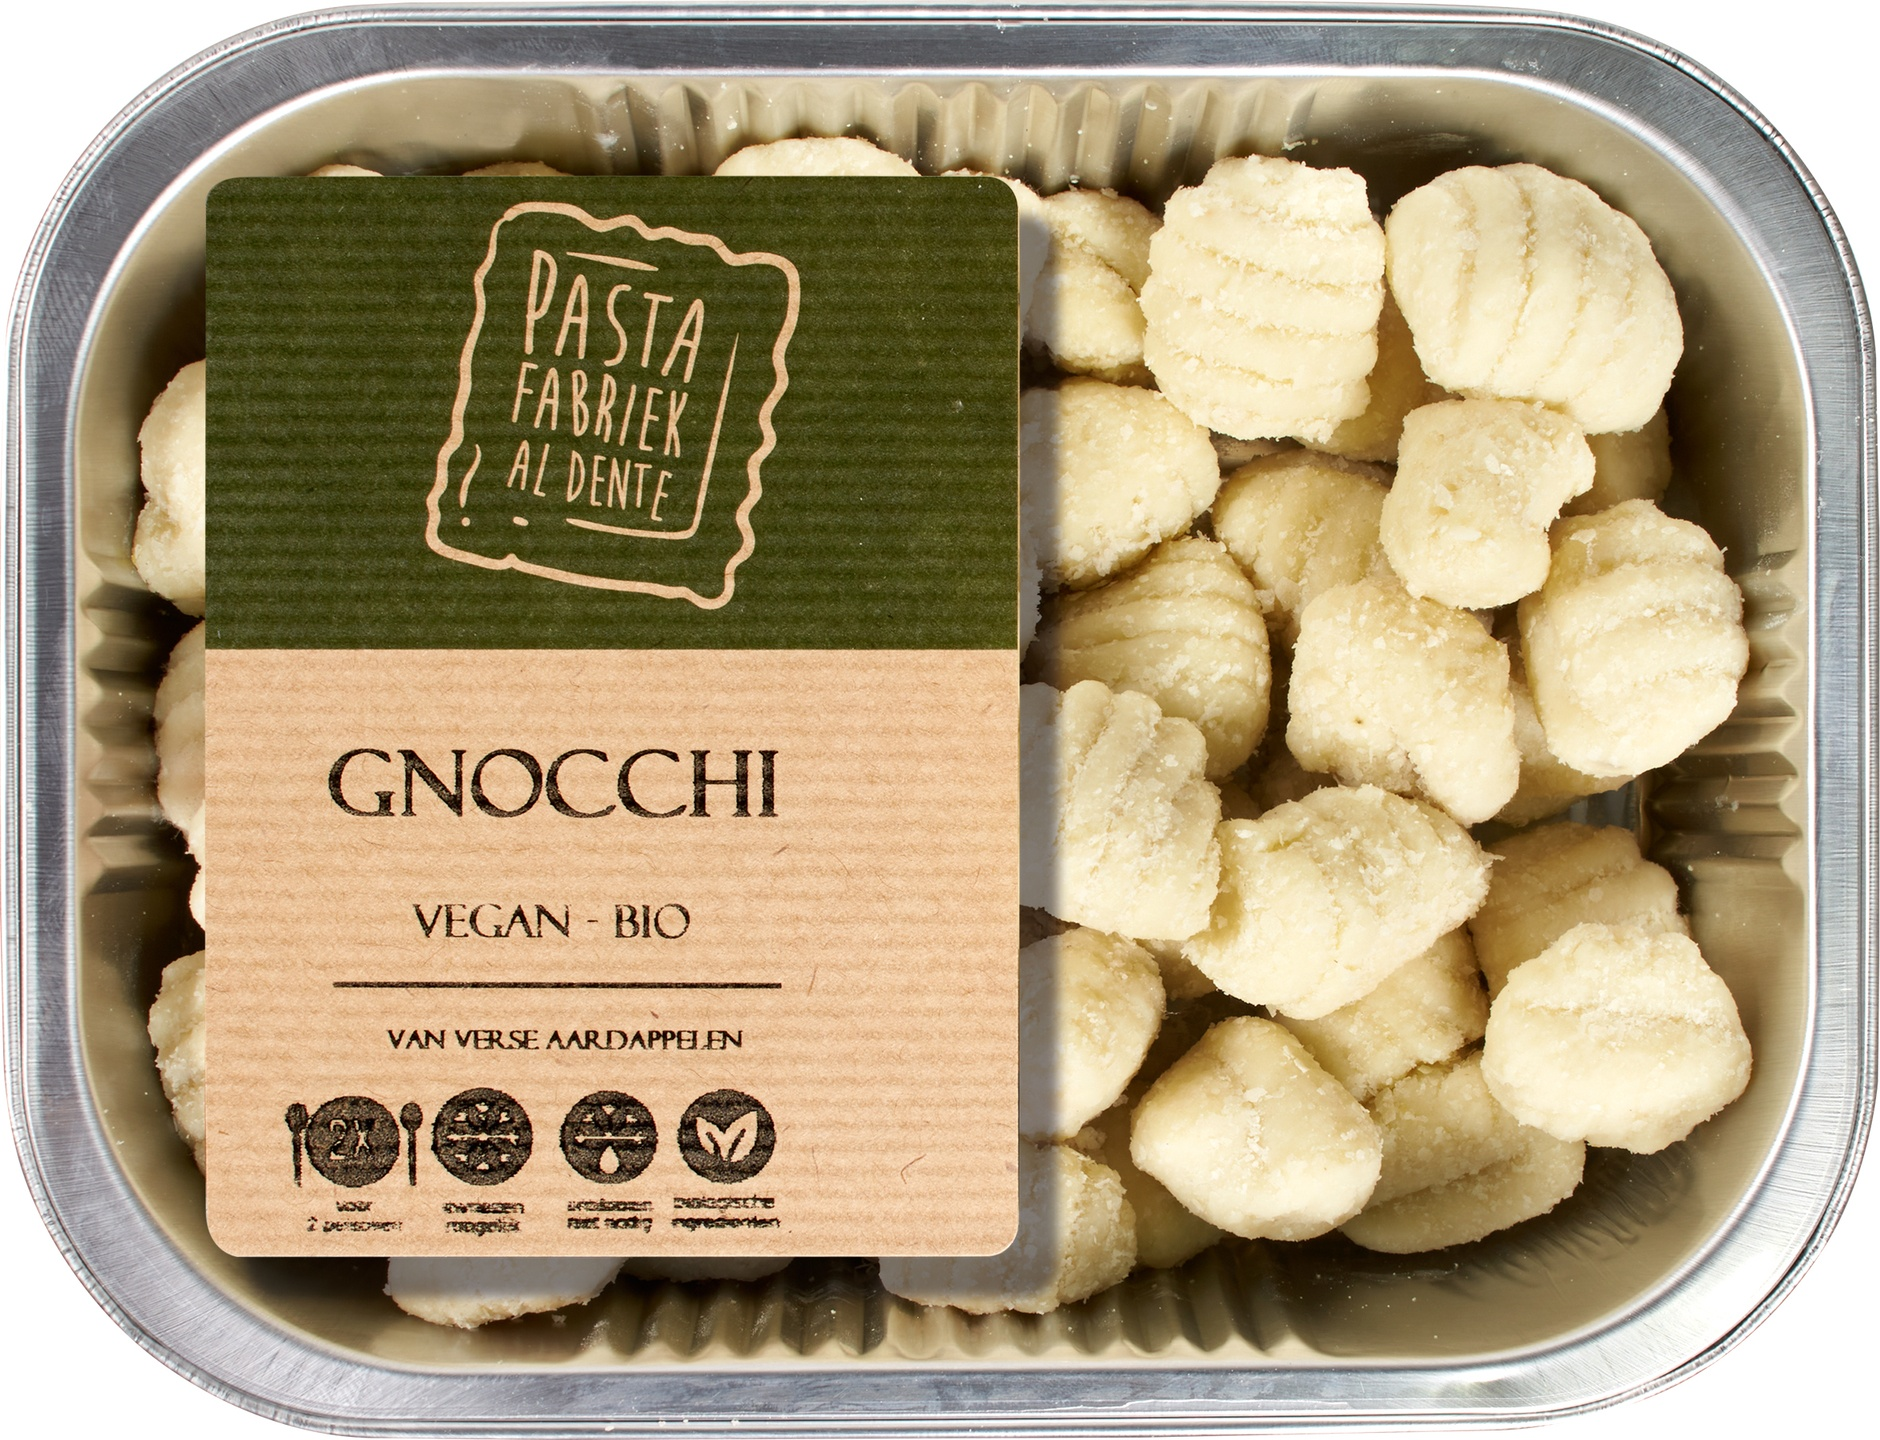 Biologische De Pastafabriek Verse gnocchi 250 gr